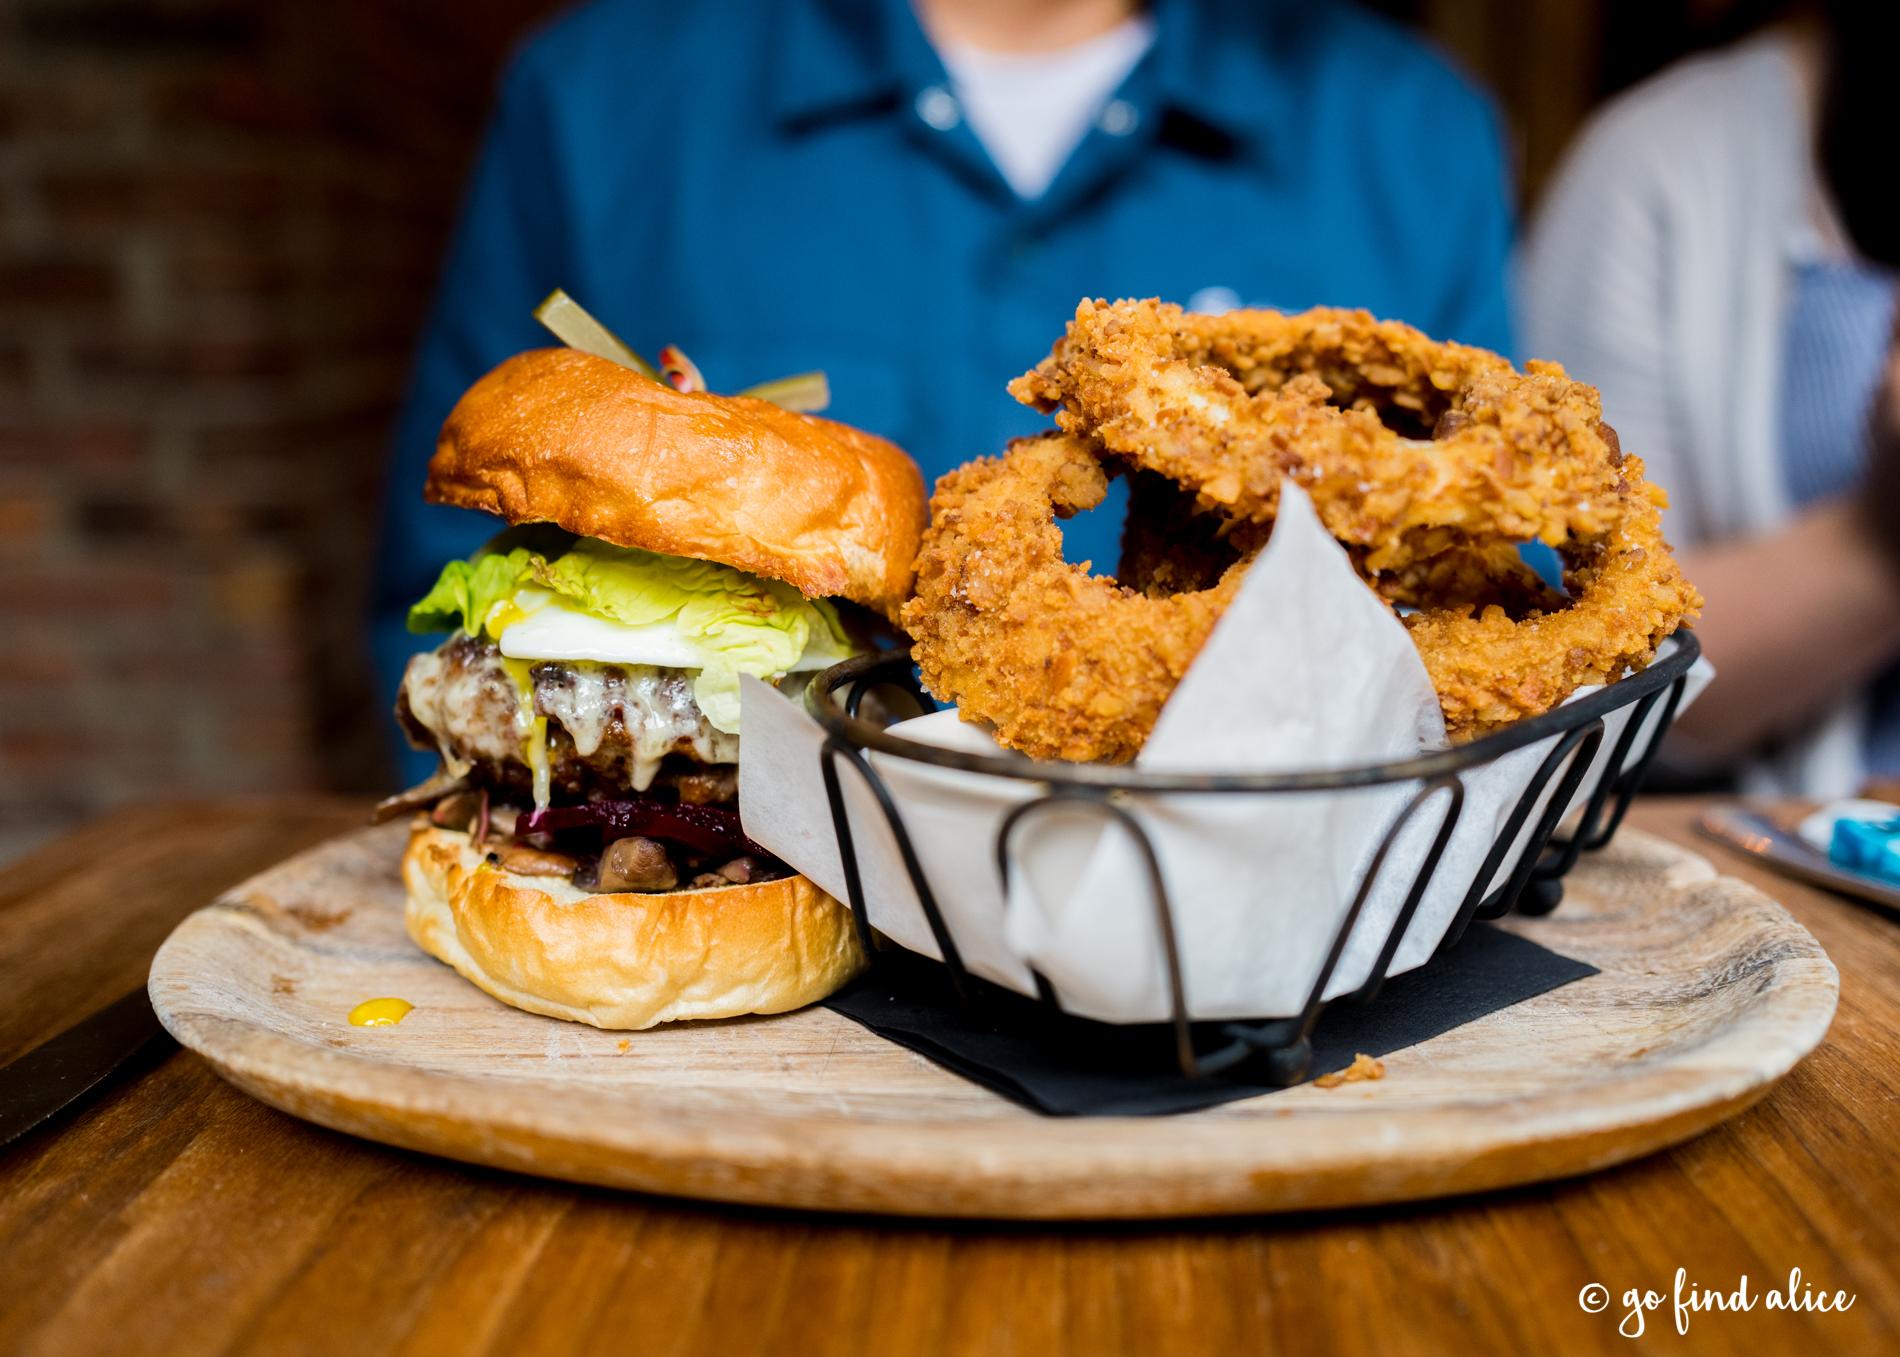 Highlands Burger, Black Angus, Pickled Beet, Scottish Cheddar, Fried Egg, Mushrooms, Black Garlic-Horseradish Aioli, Pretzel Crusted Onion Rings ($17)